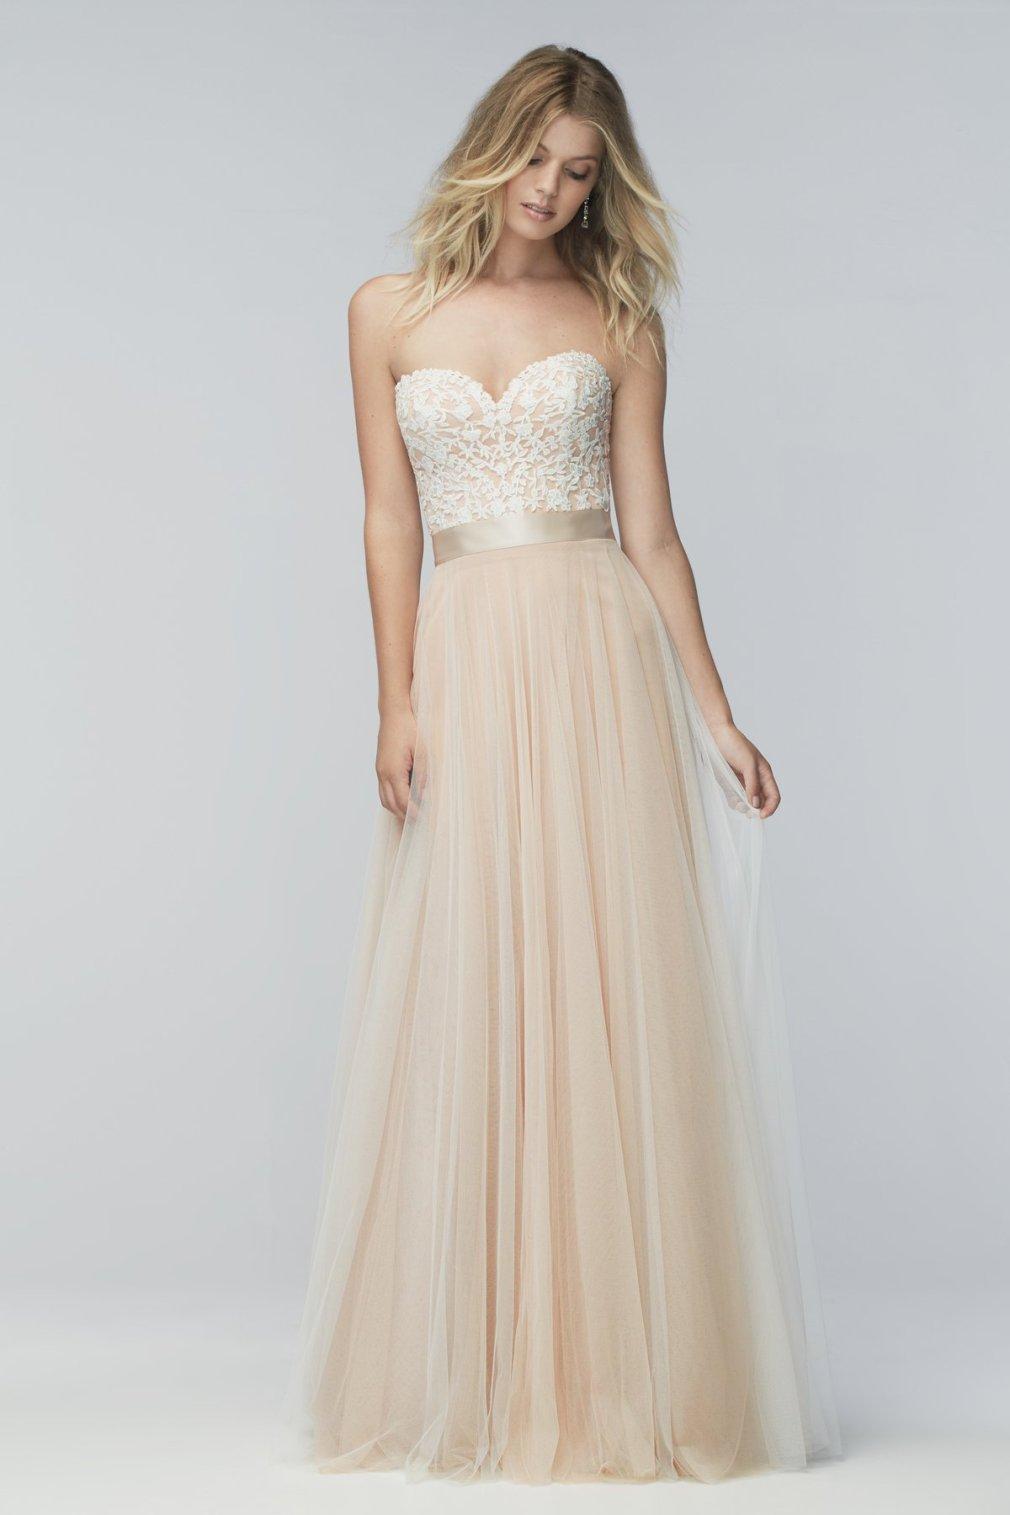 new york bride groom wedding dress bridesmaid dress rental tuxedo accessories raleigh nc